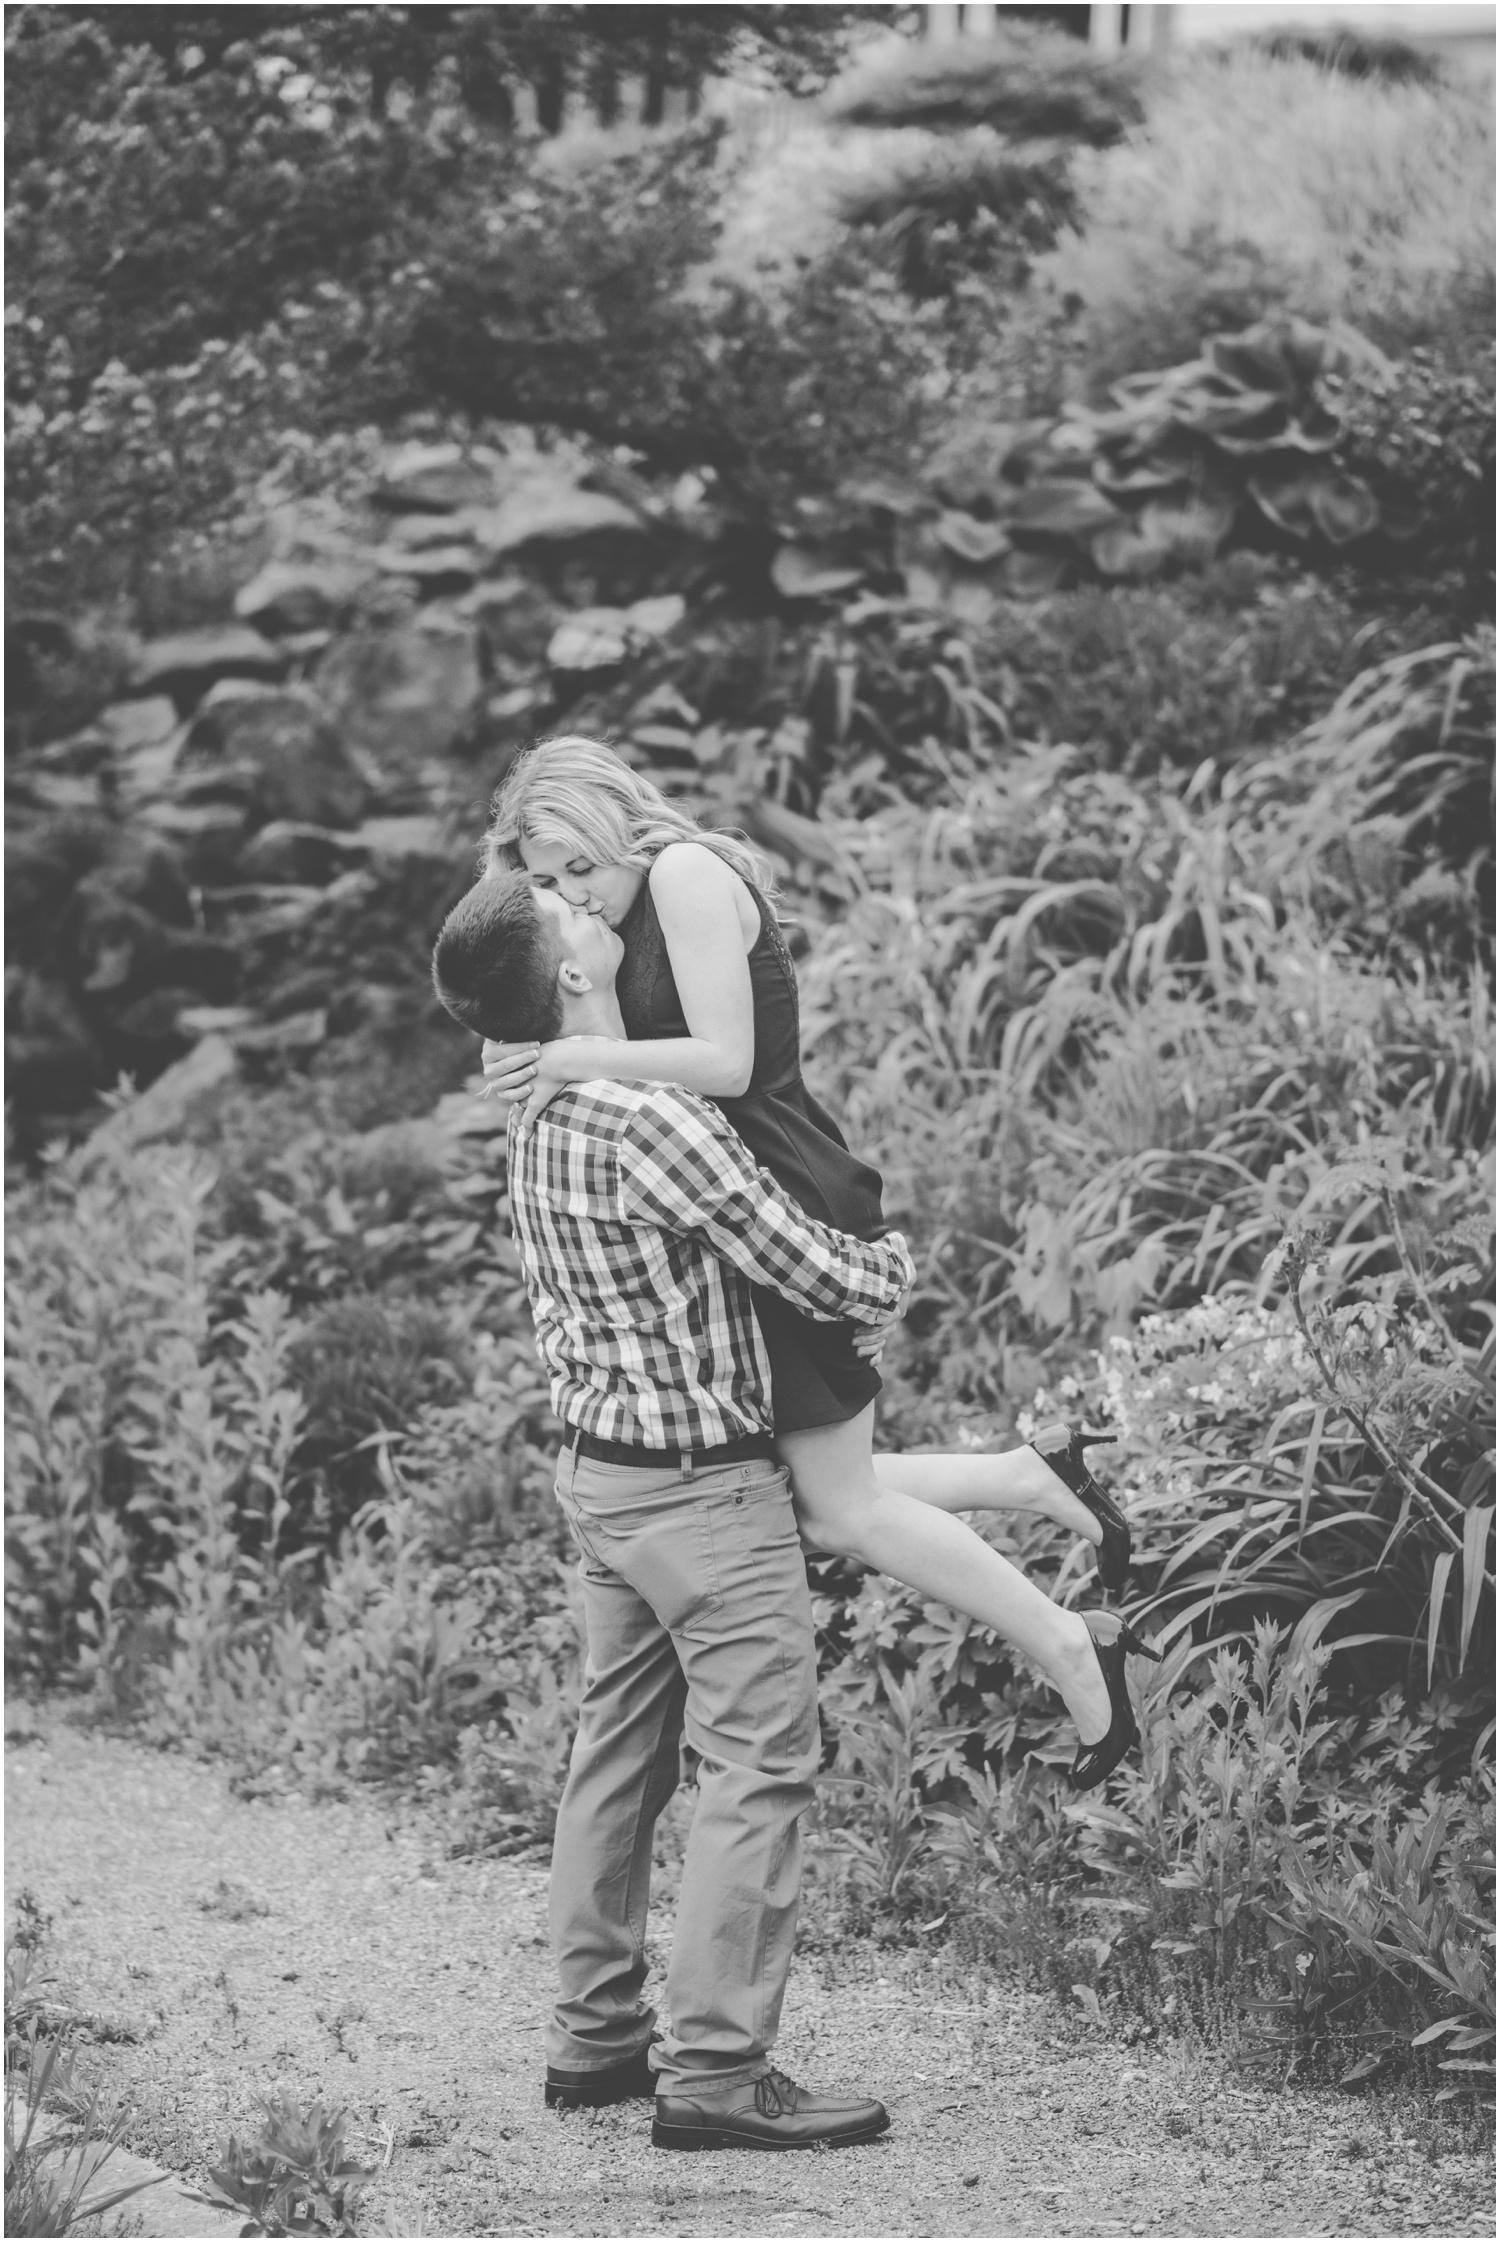 Paquette_Park_Portage_WI_Engagement_Photos_Heather_and_Derek_0029.jpg